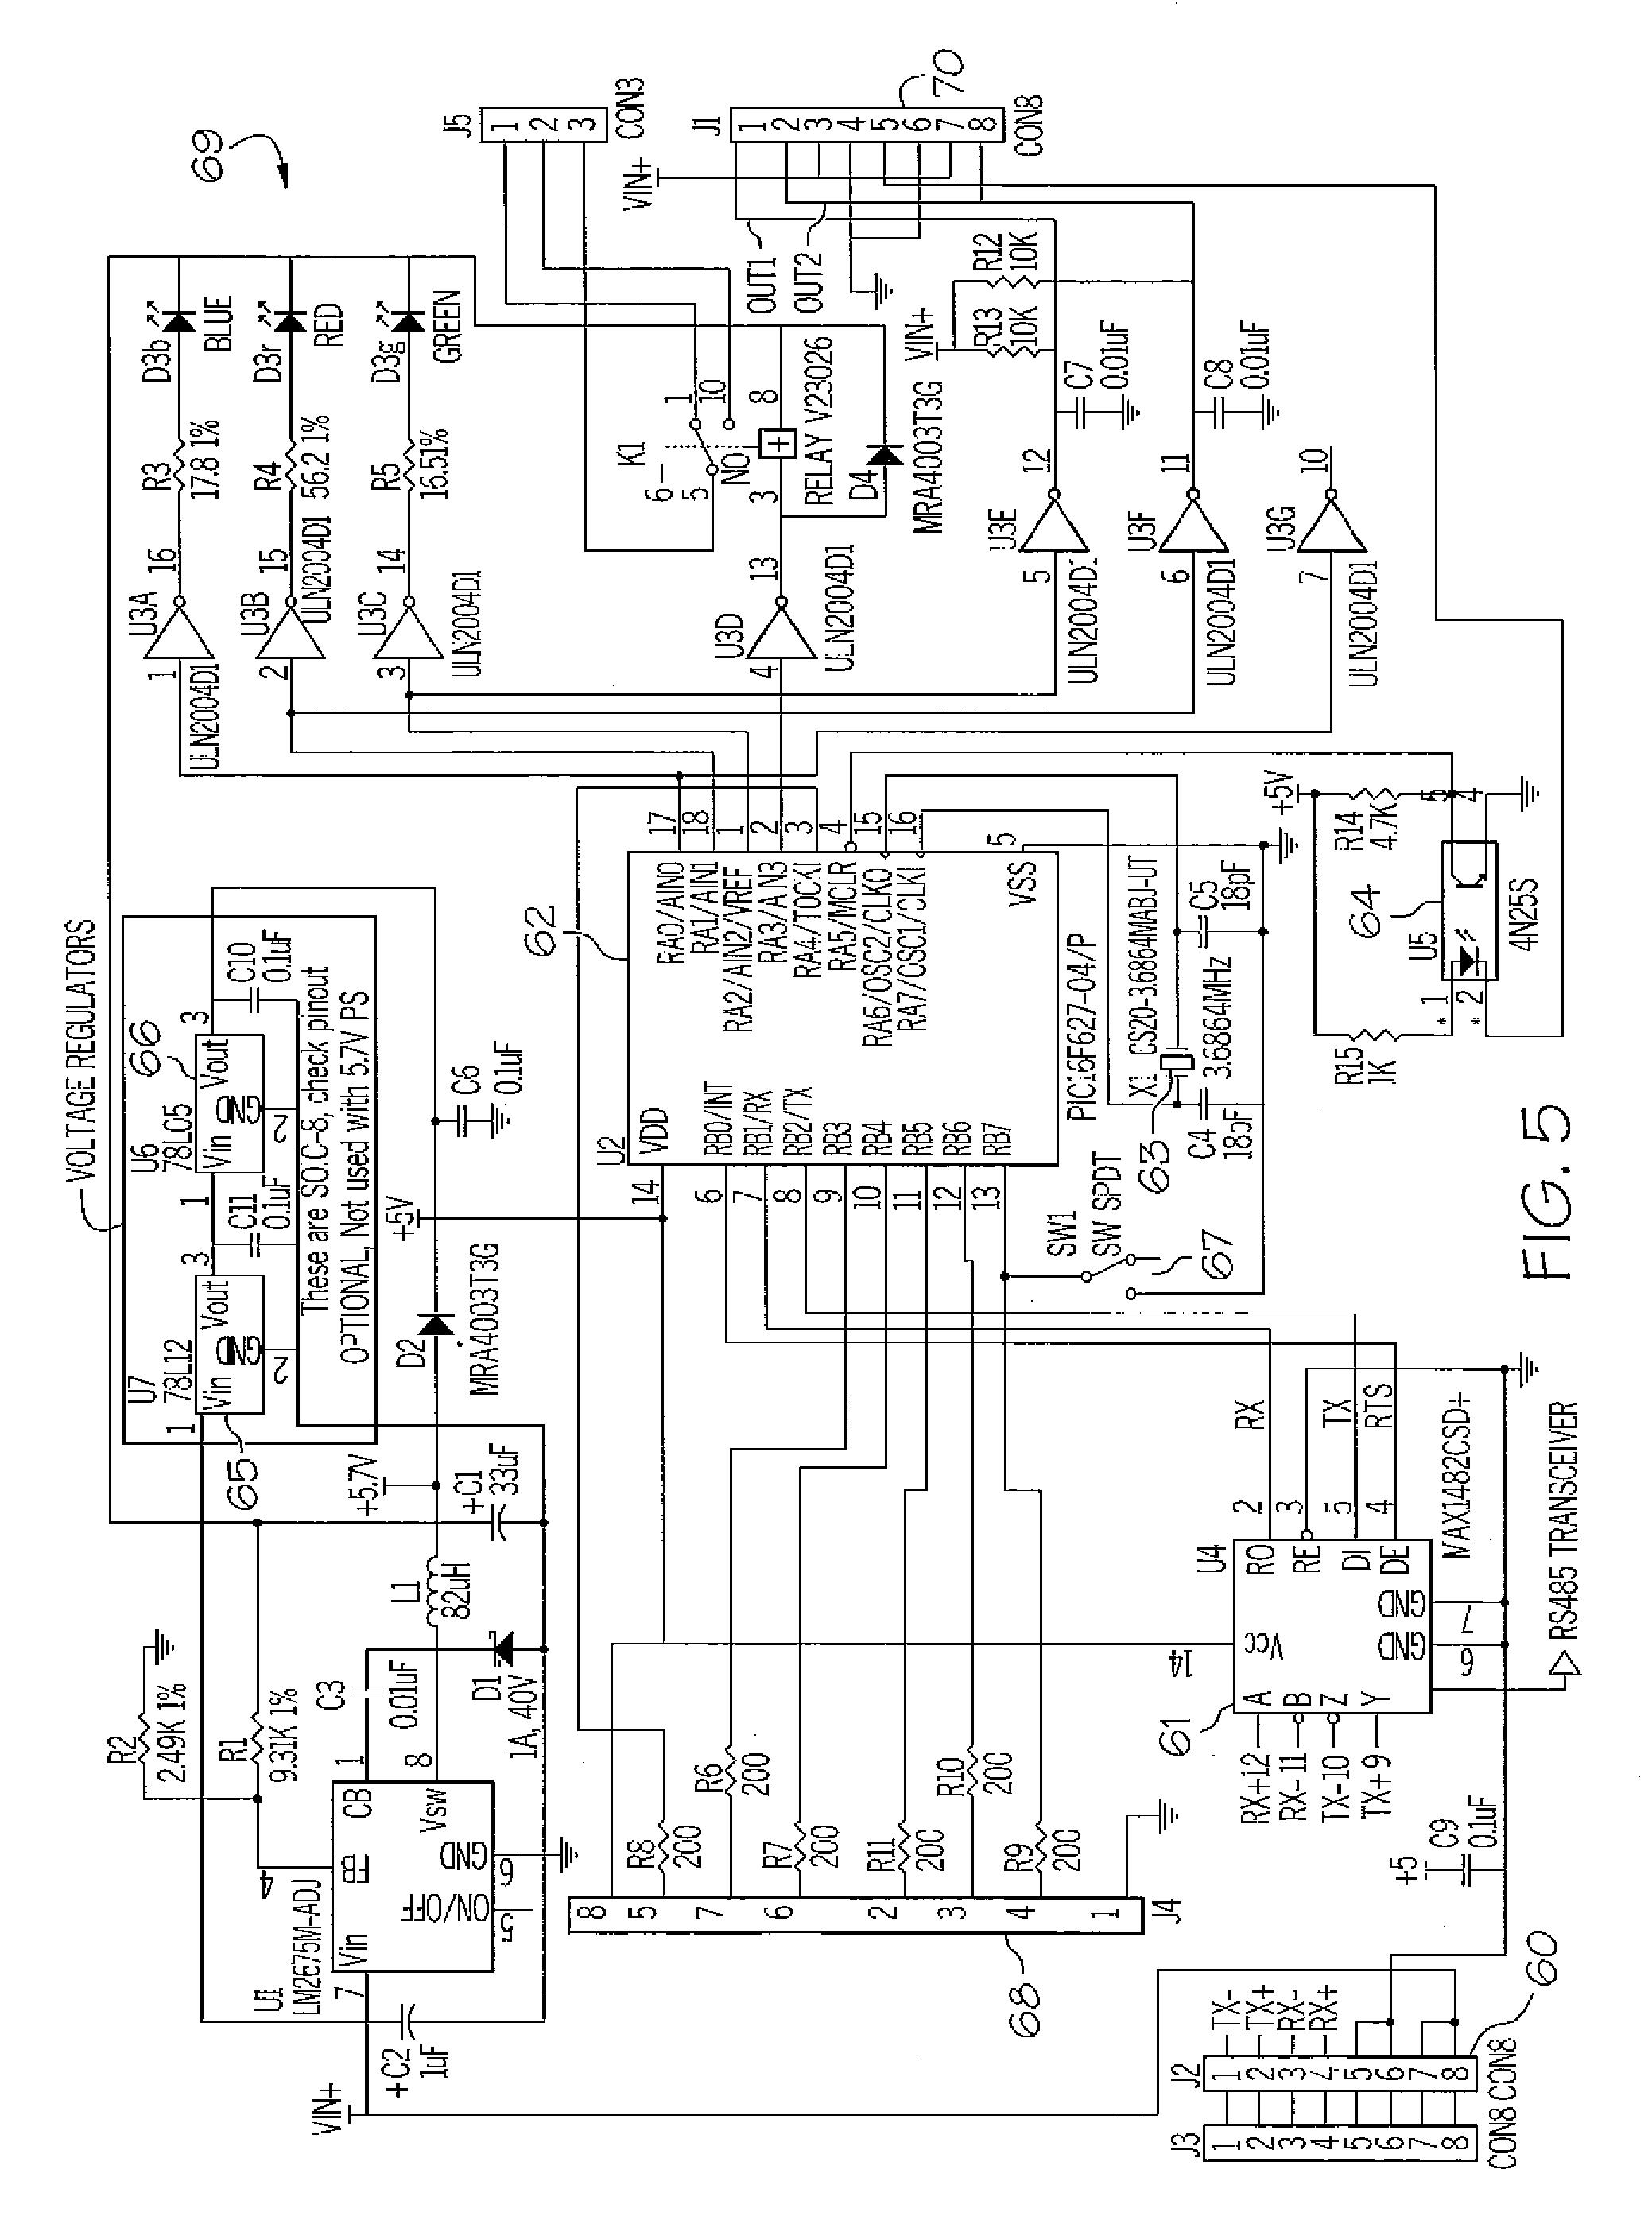 tektone emergency pull cord wiring diagram